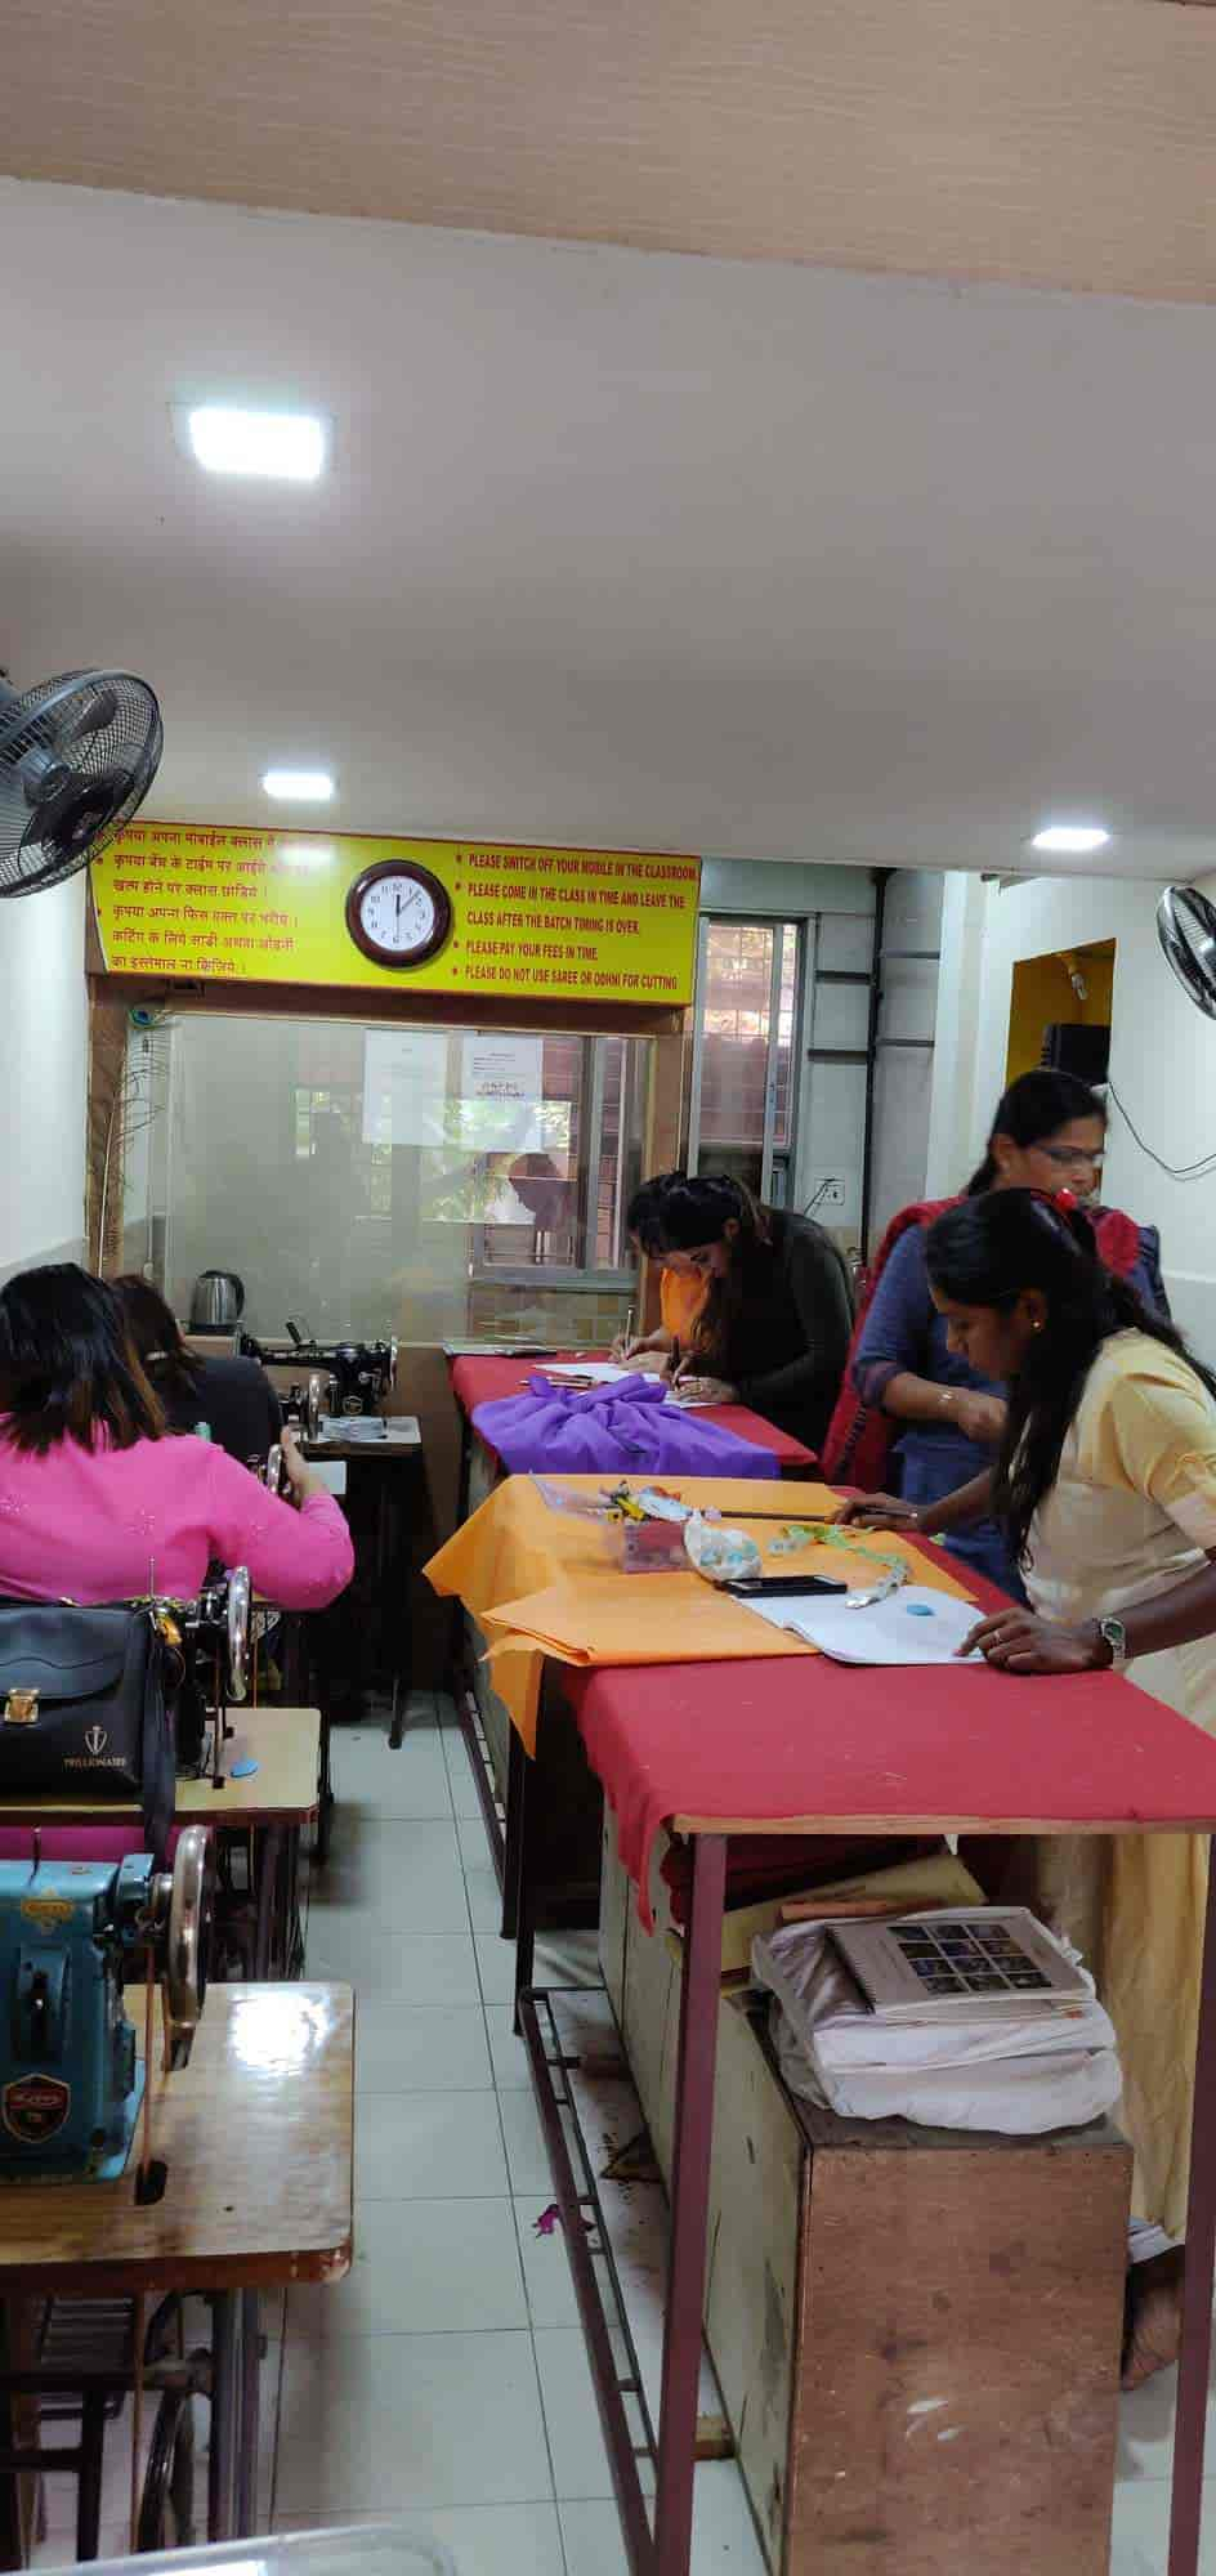 Keny Fashion Institute Kandivali West Tailoring Classes In Mumbai Justdial